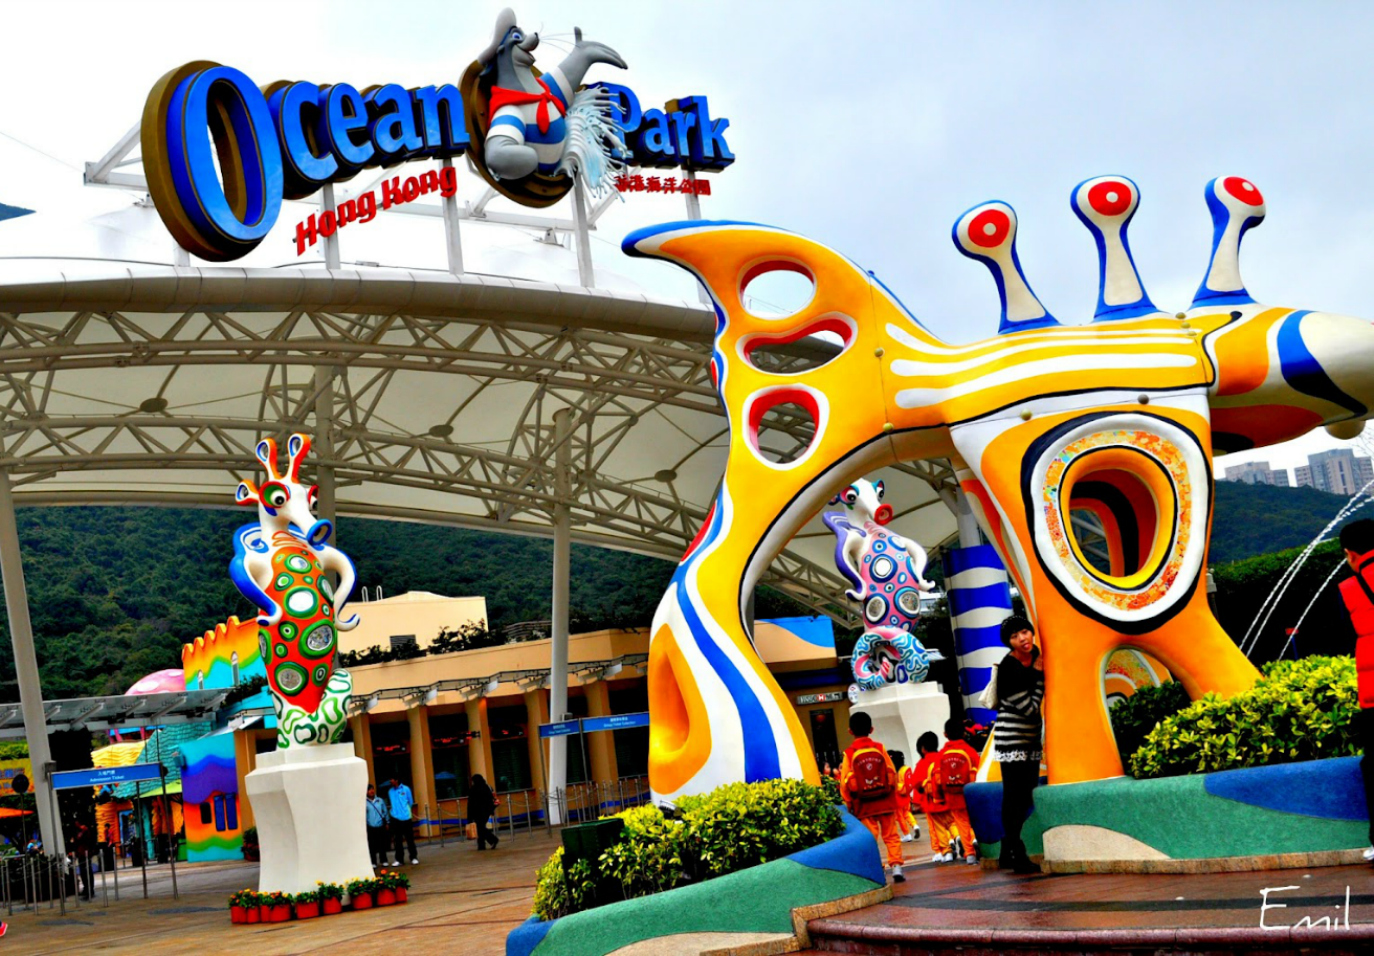 Hong Kong Macau Tour Package With Cruise - 6 Nights 7 Days